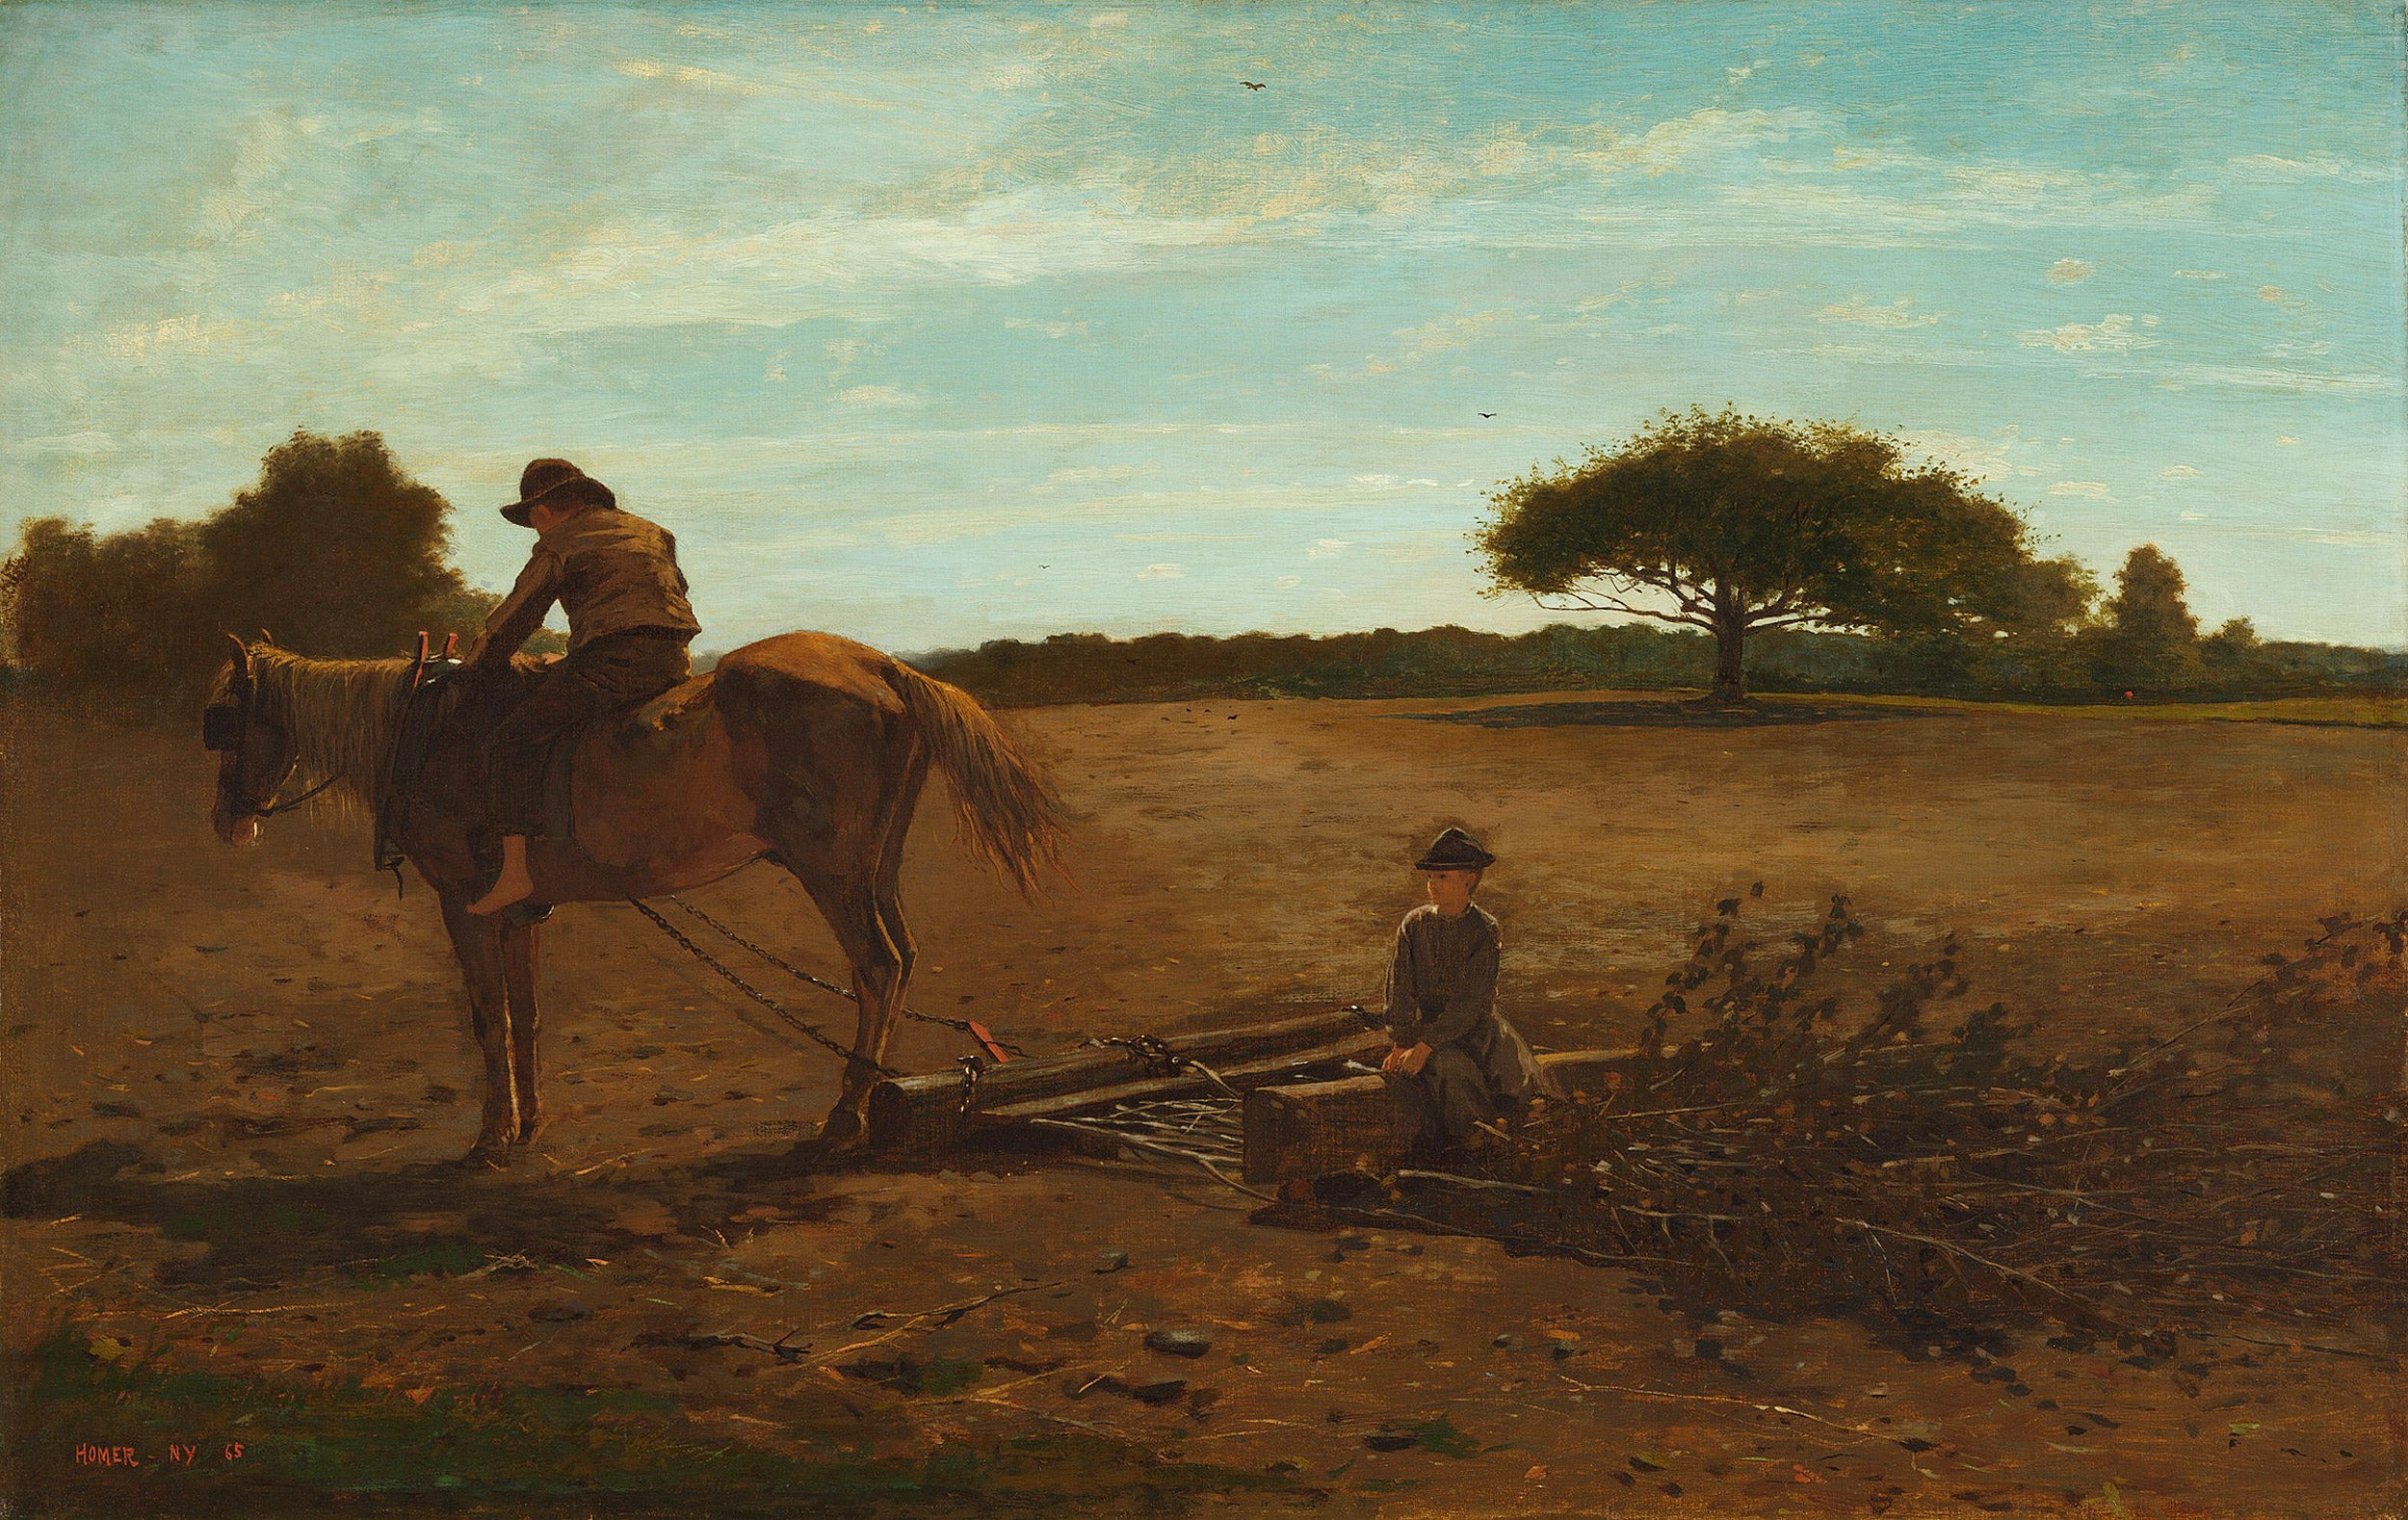 Winslow Homer's work as Civil War art correspondent focus of 'Eyewitness' exhibit at Harvard